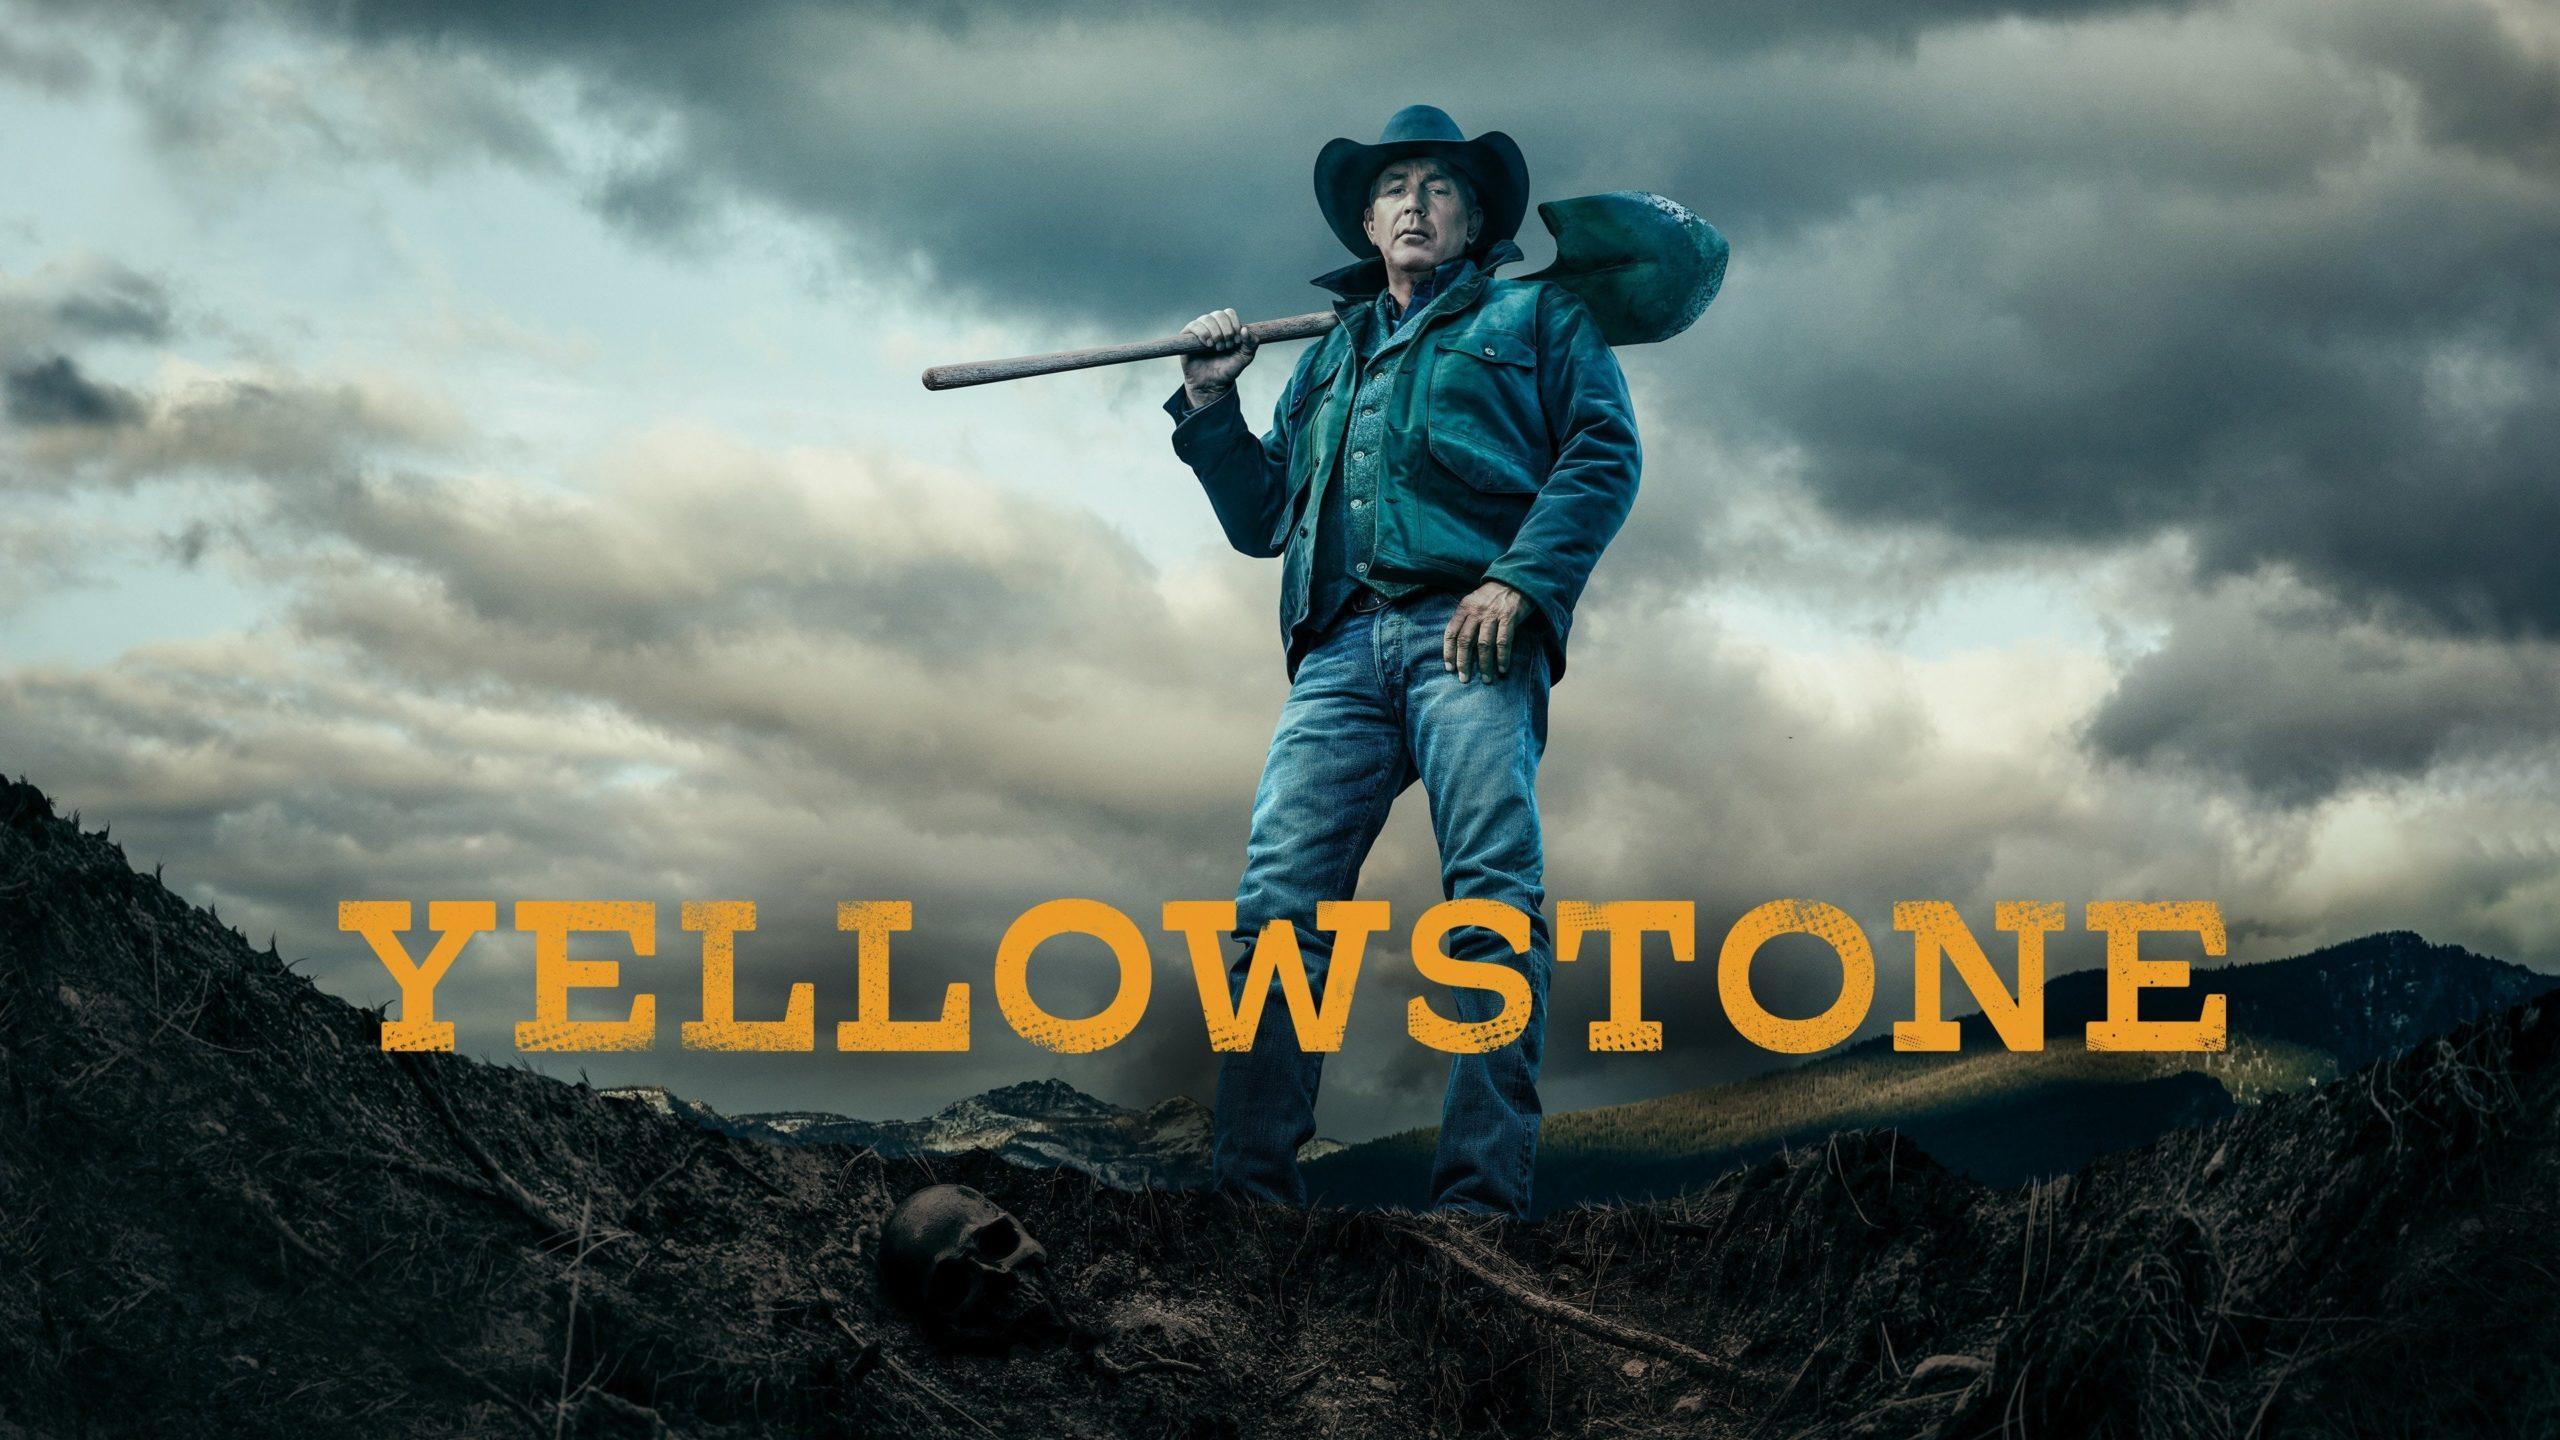 720p~ Yellowstone Season 3 Episode 9